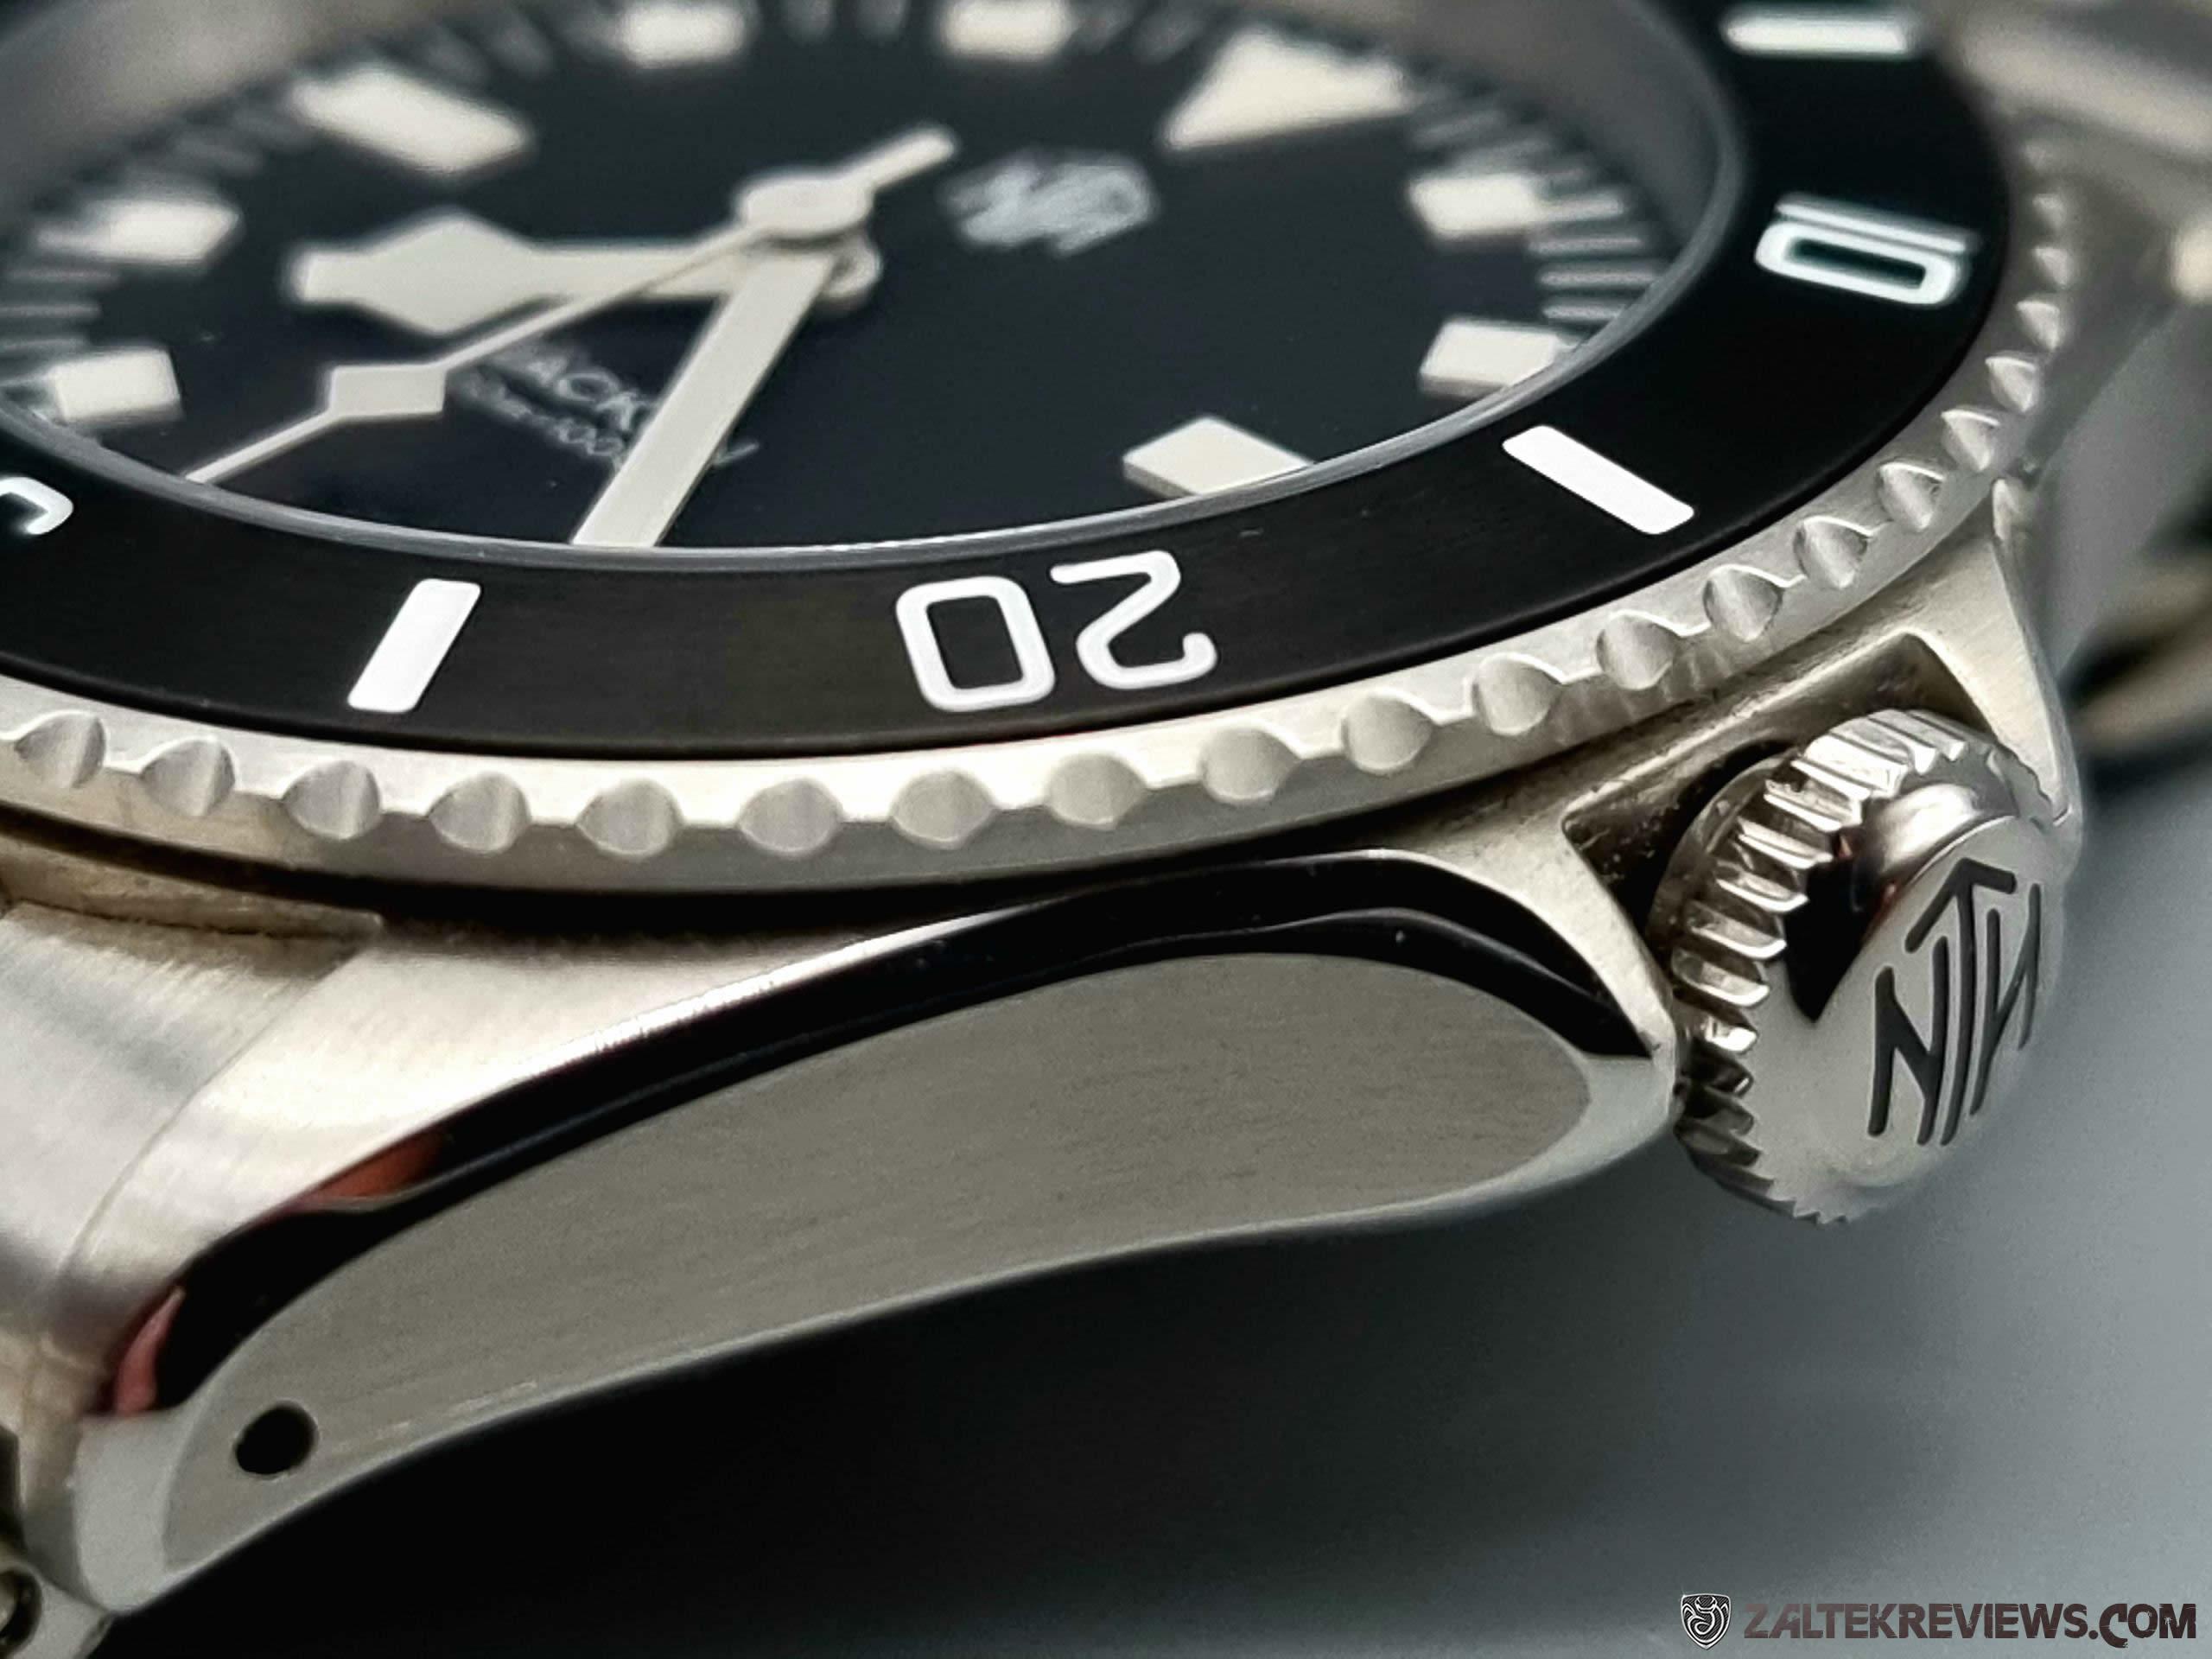 NTH Näcken v2 Modern Black Dive Watch Review